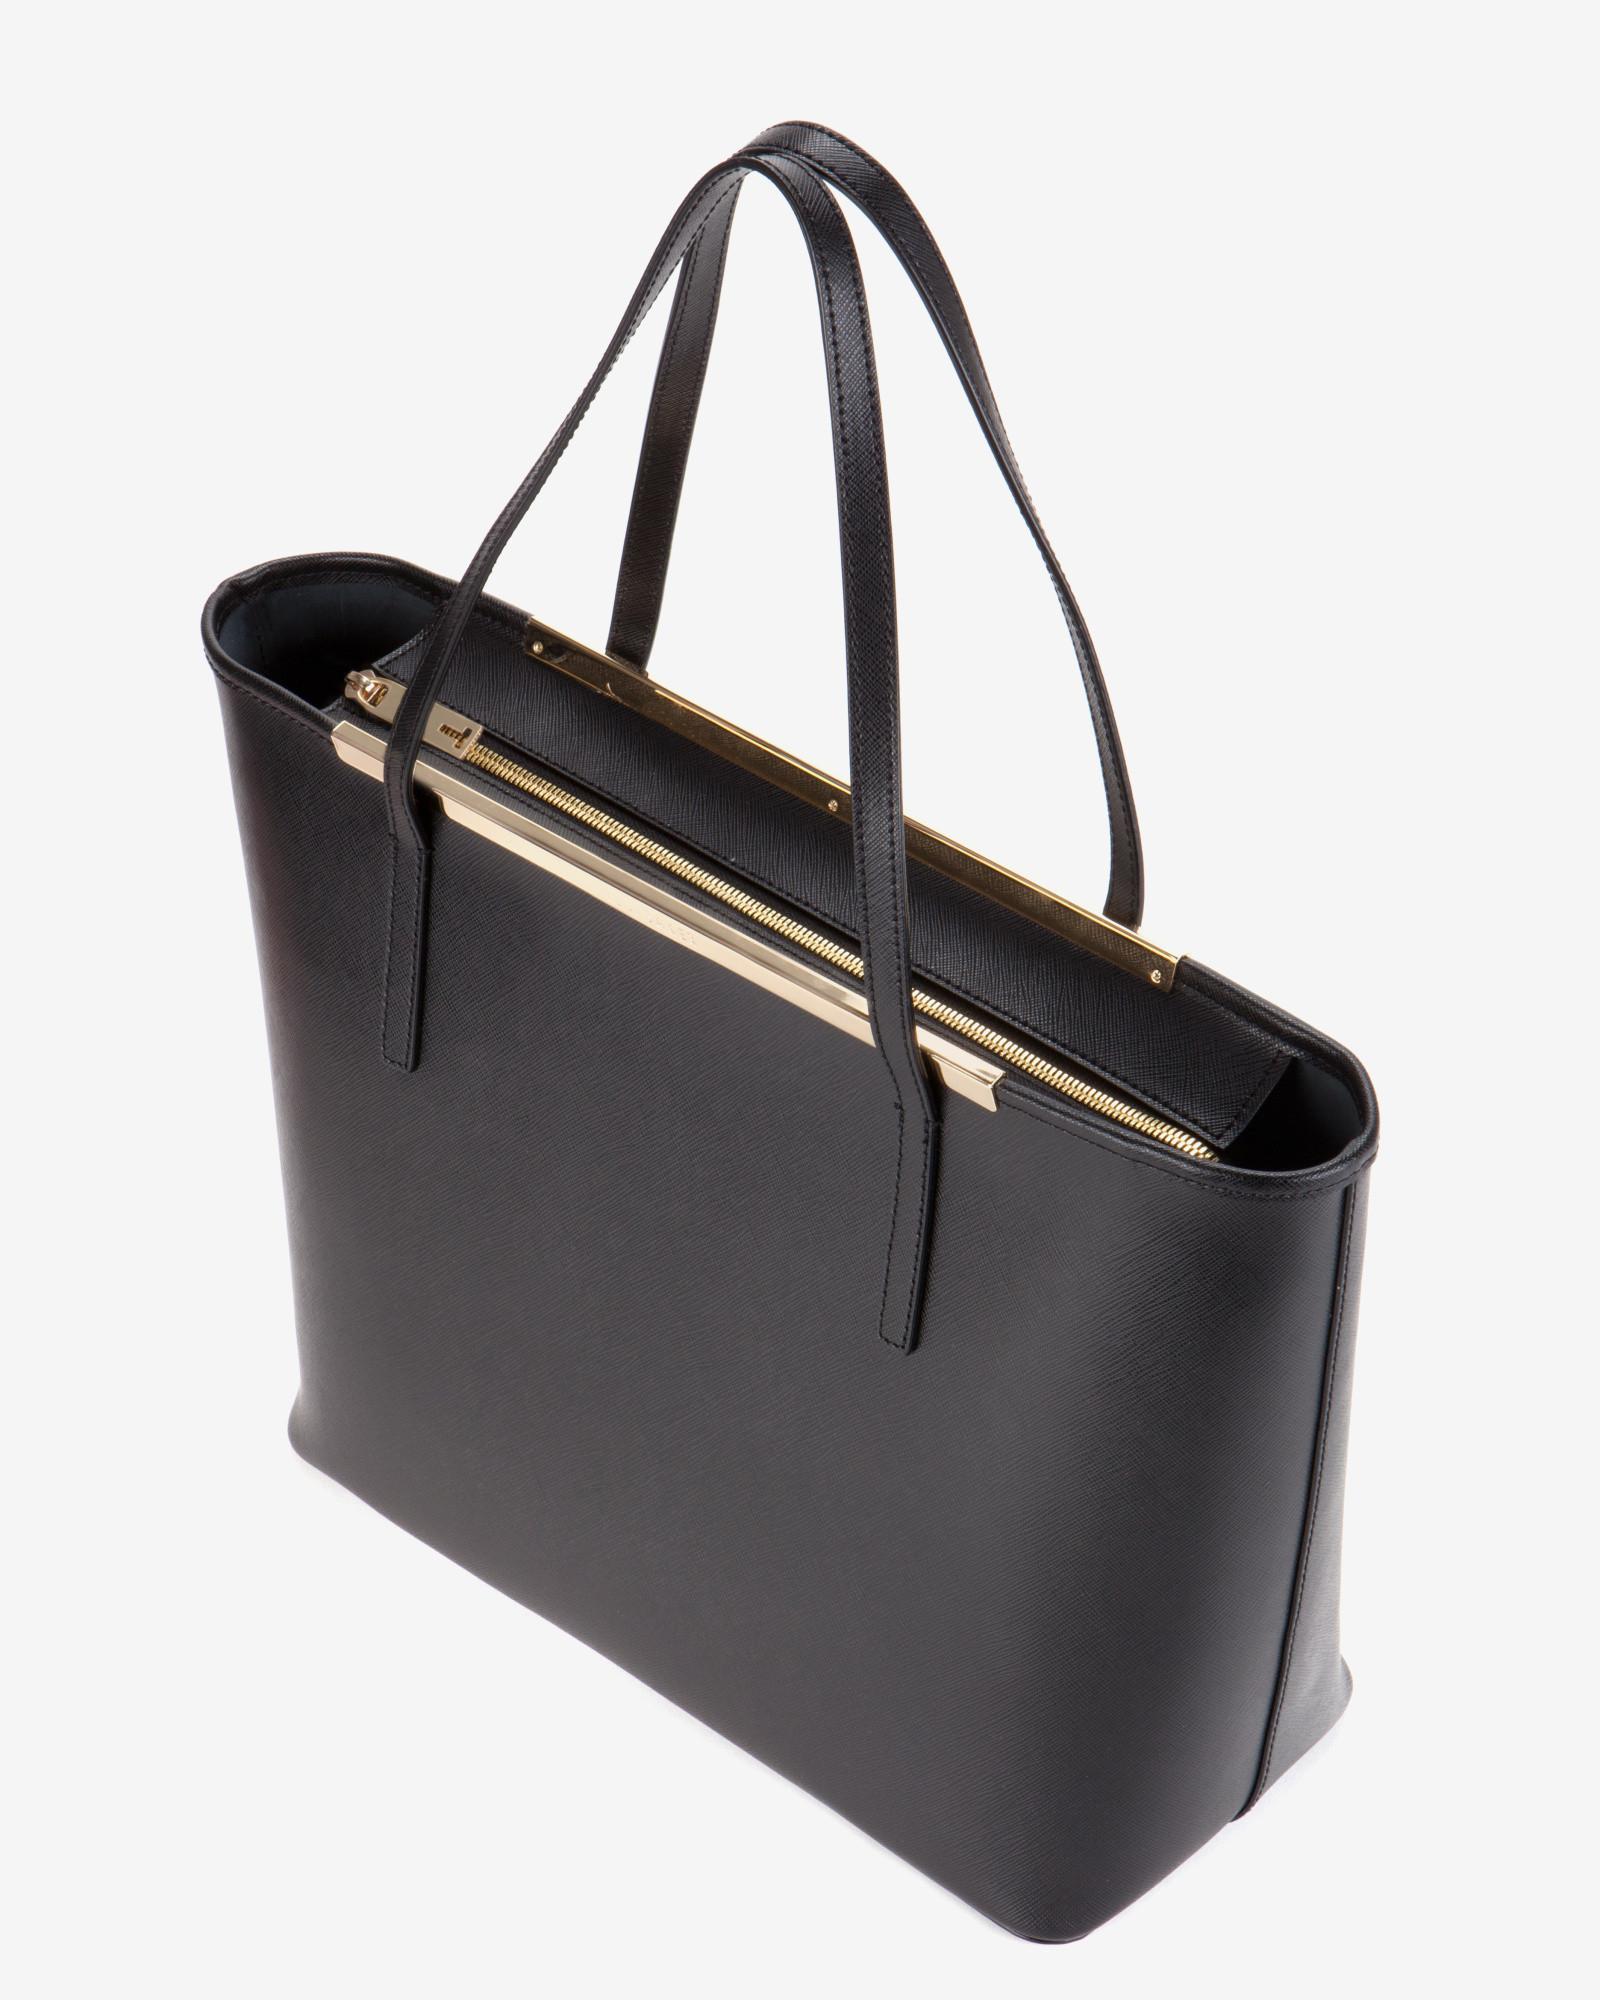 231e62d027e76 Lyst - Ted Baker Large Crosshatch Leather Shopper Bag in Black